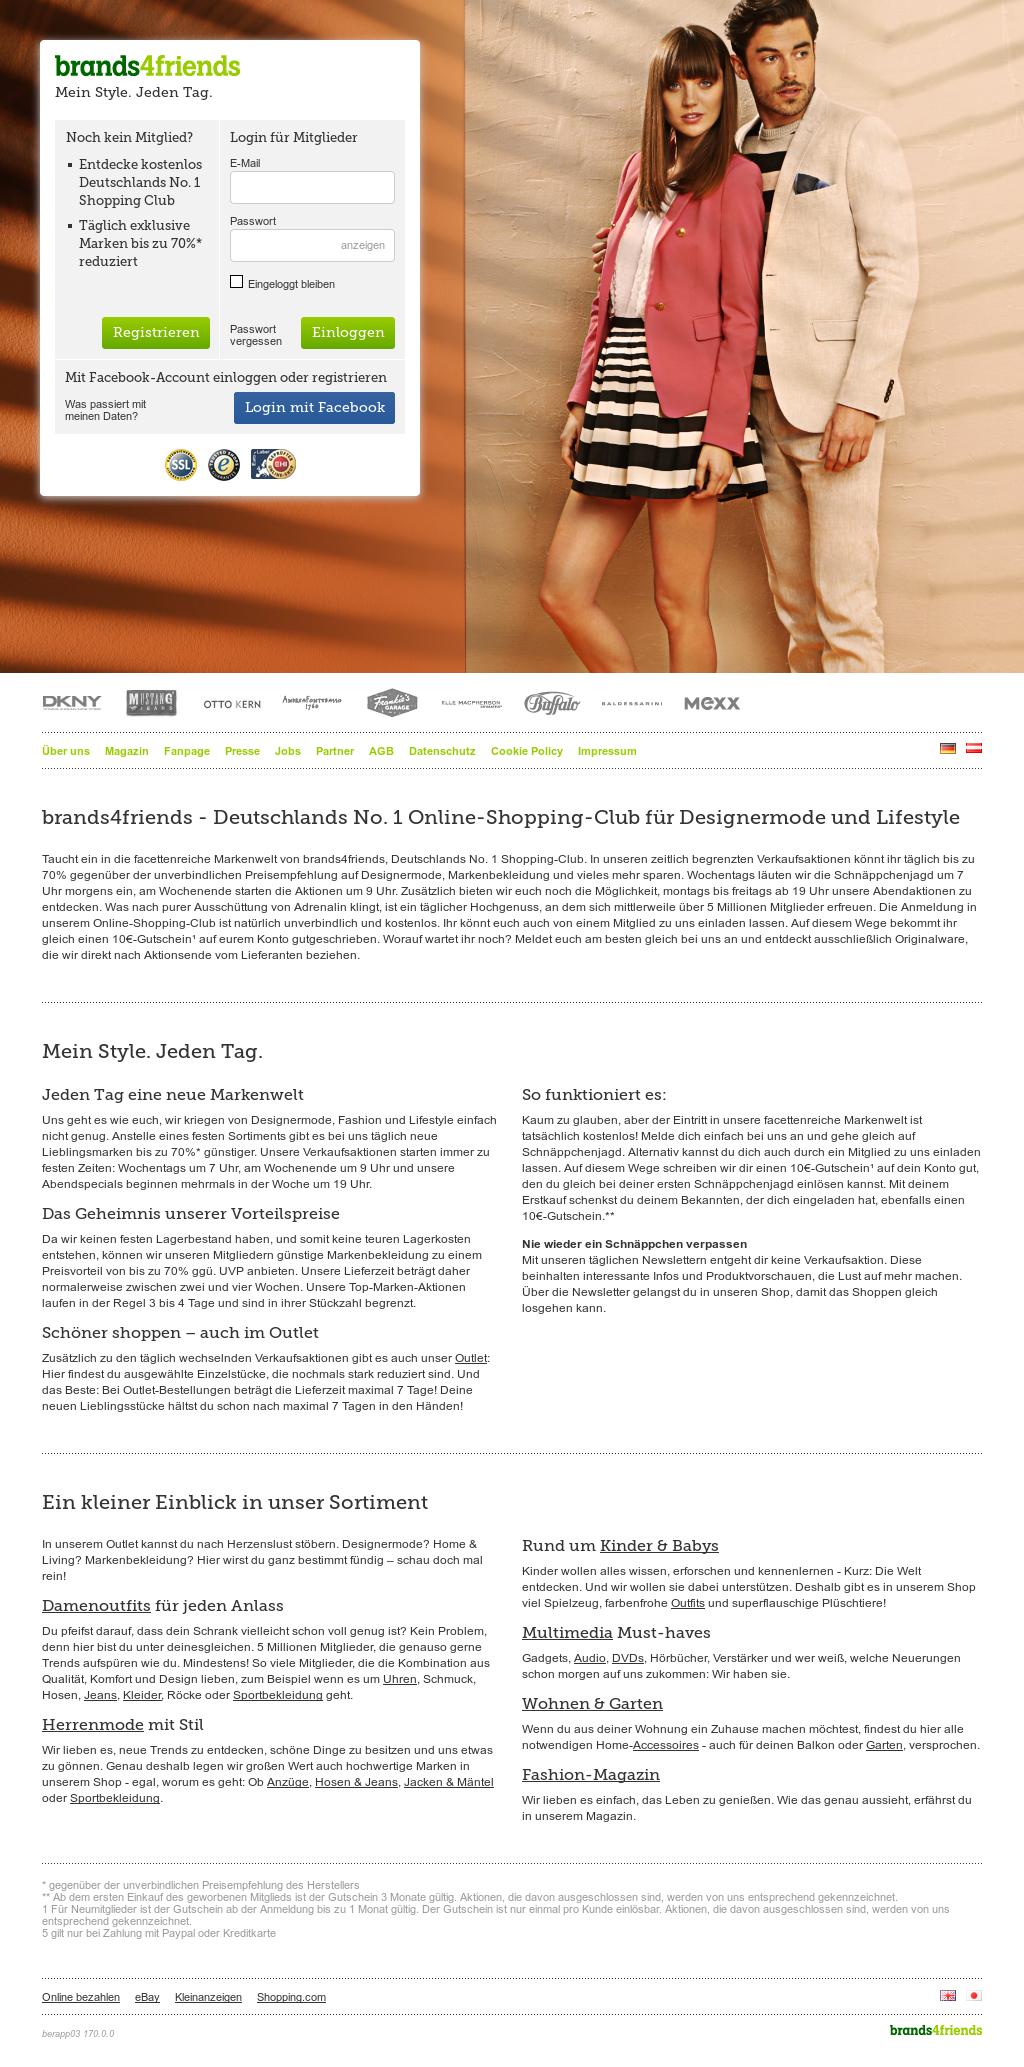 Enchanting Deinschrank De Lieferzeit Collection Of Petitors, Revenue And Employees - Pany Profile